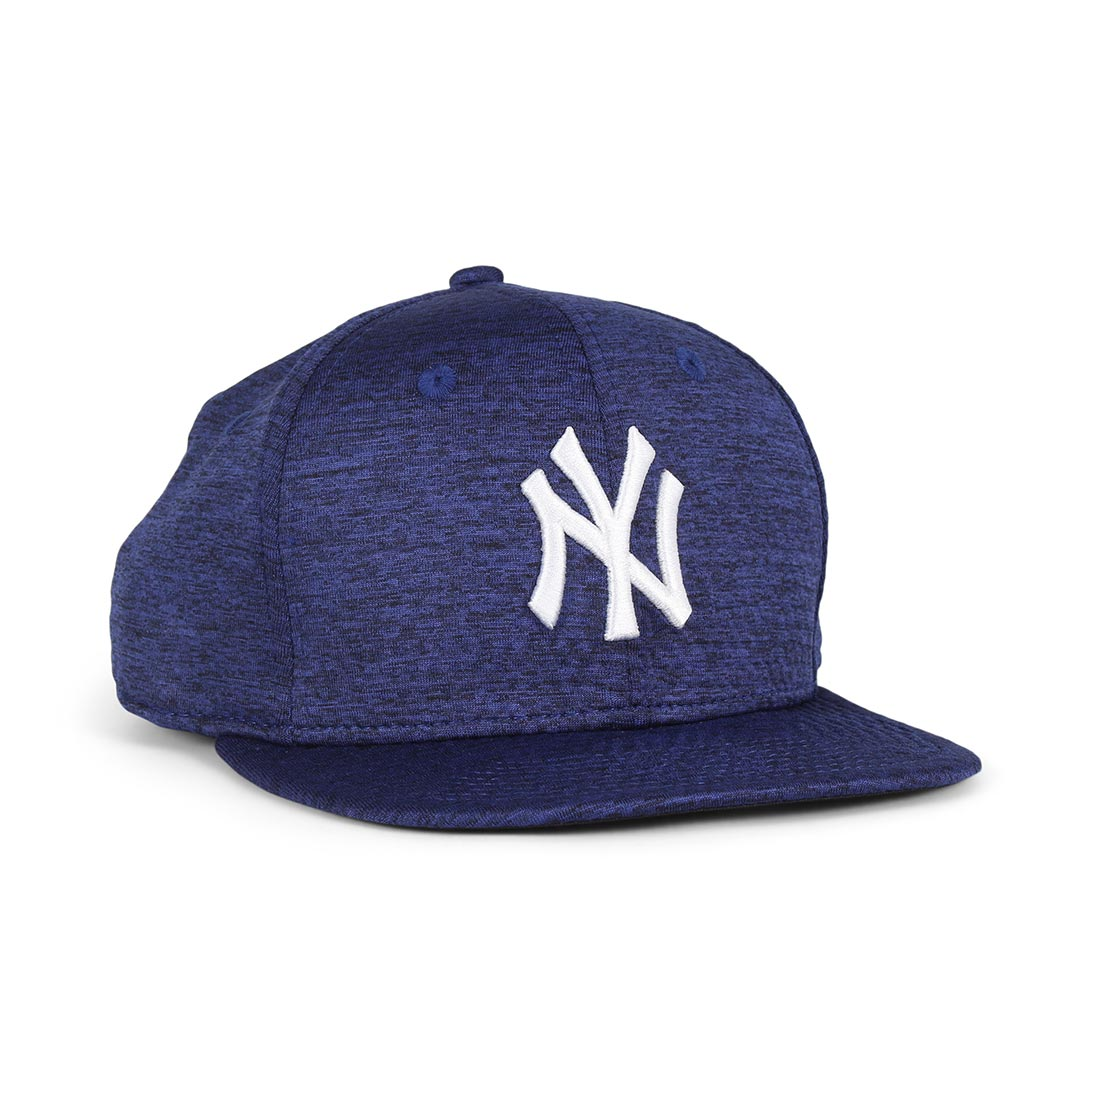 New Era NY Yankees DrySwitch 9Fifty Cap - Navy / Optic White